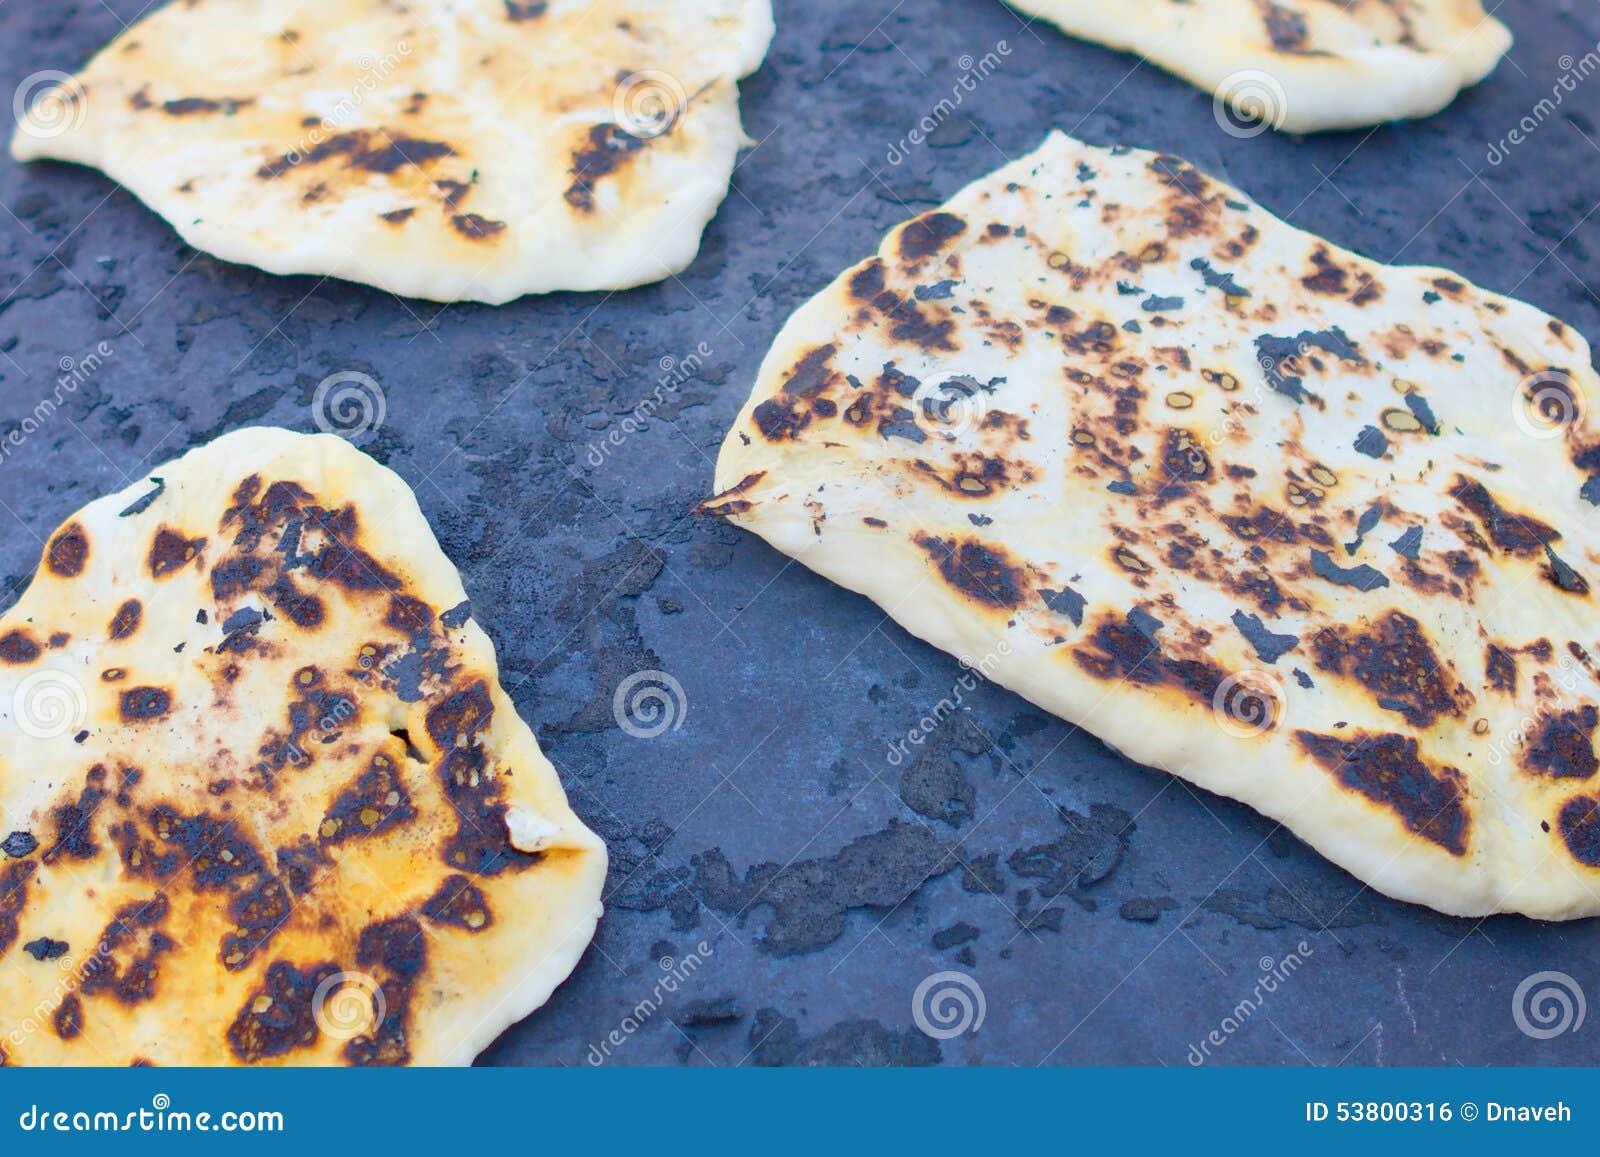 Pitabroodjebaksel op een Saj of een Tava